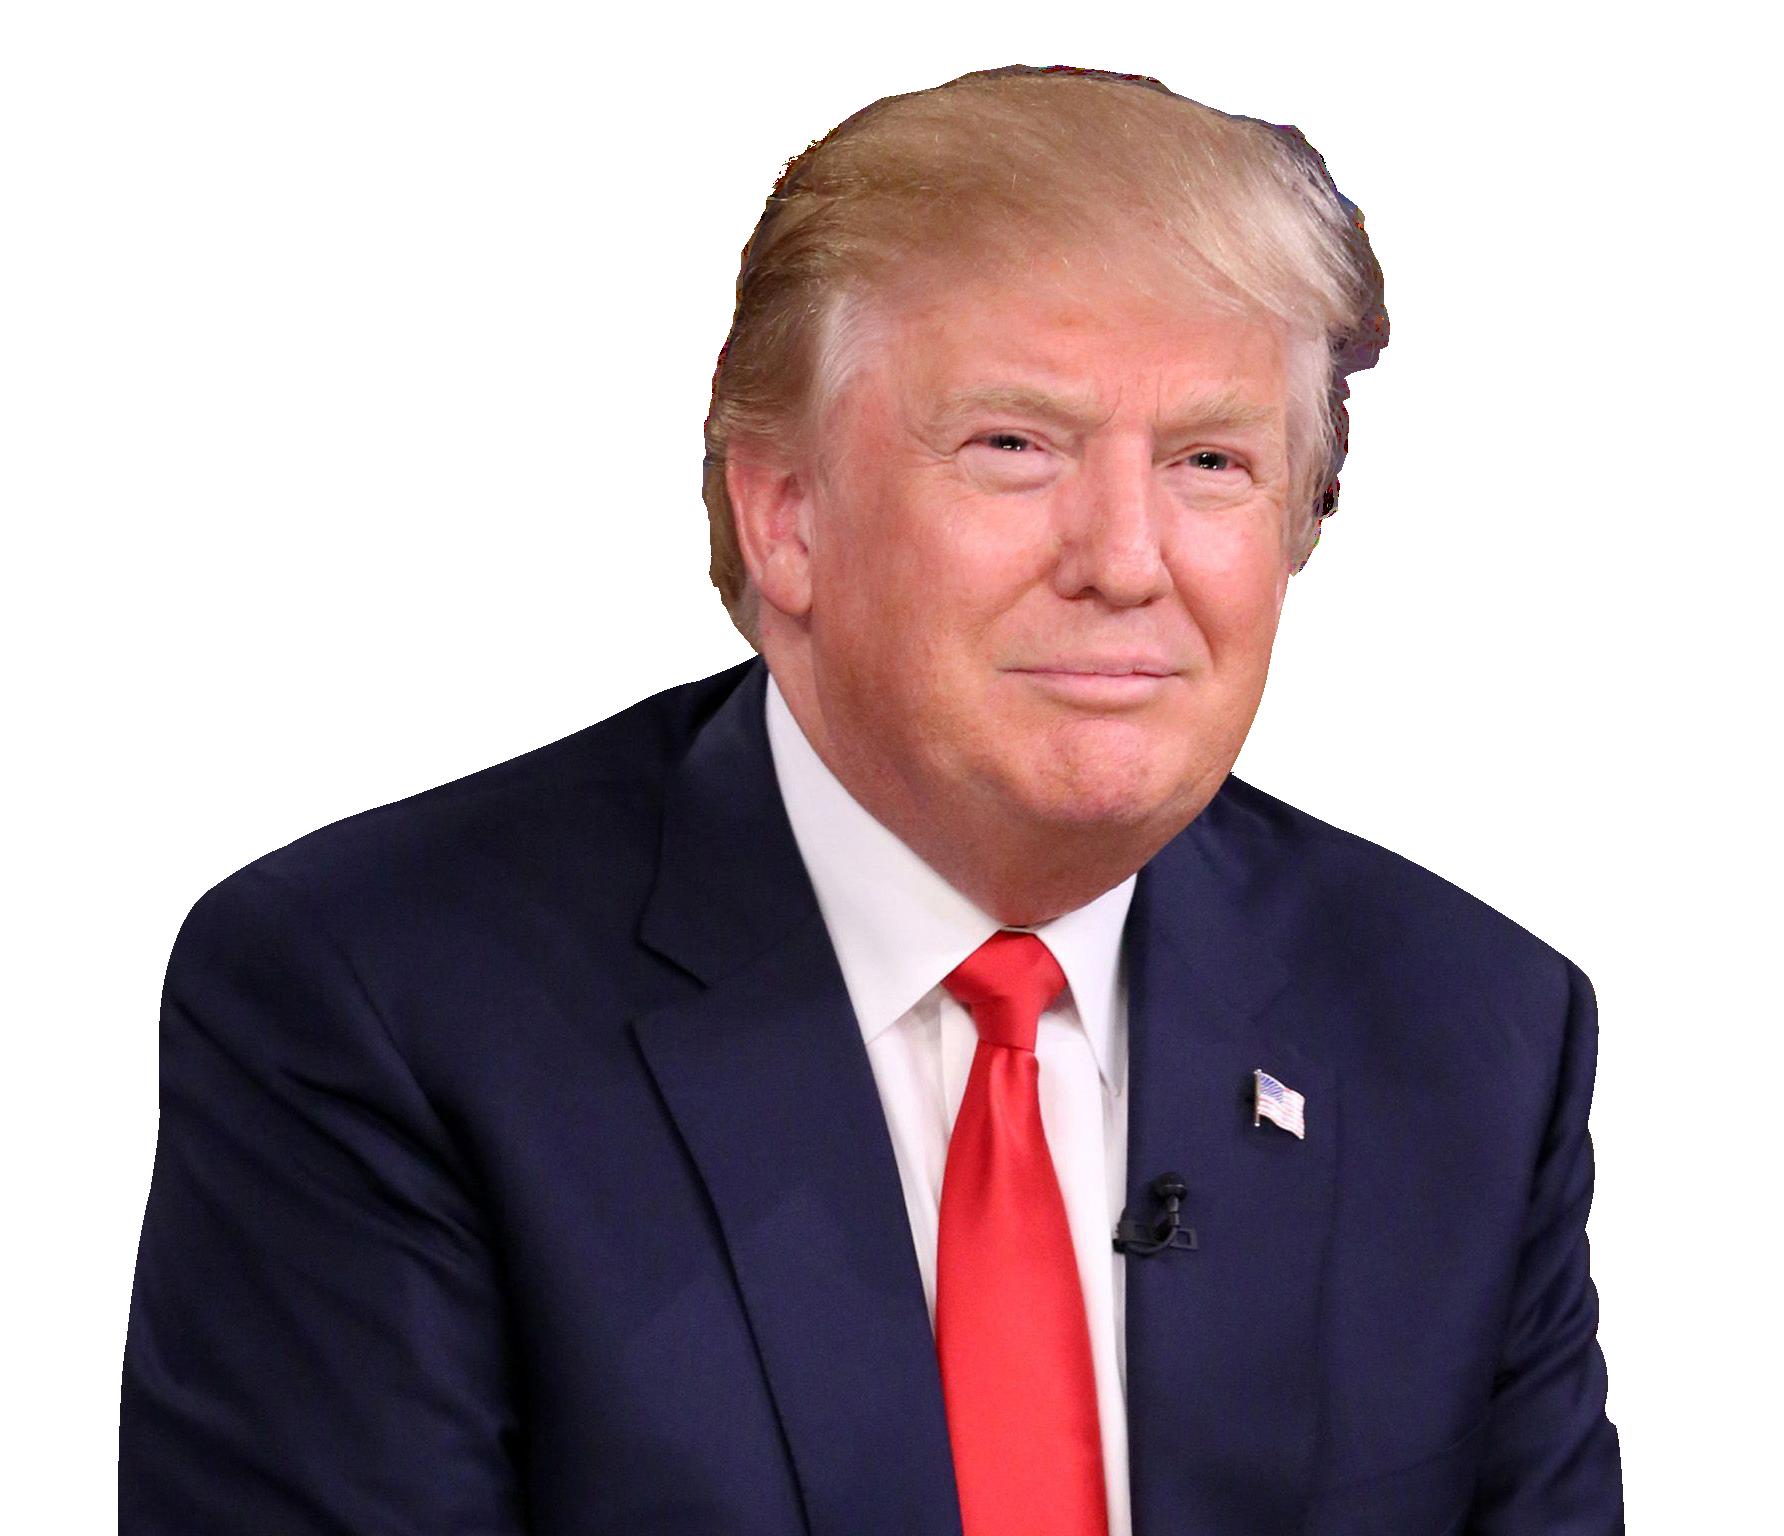 Donald Trump United States Clip art.